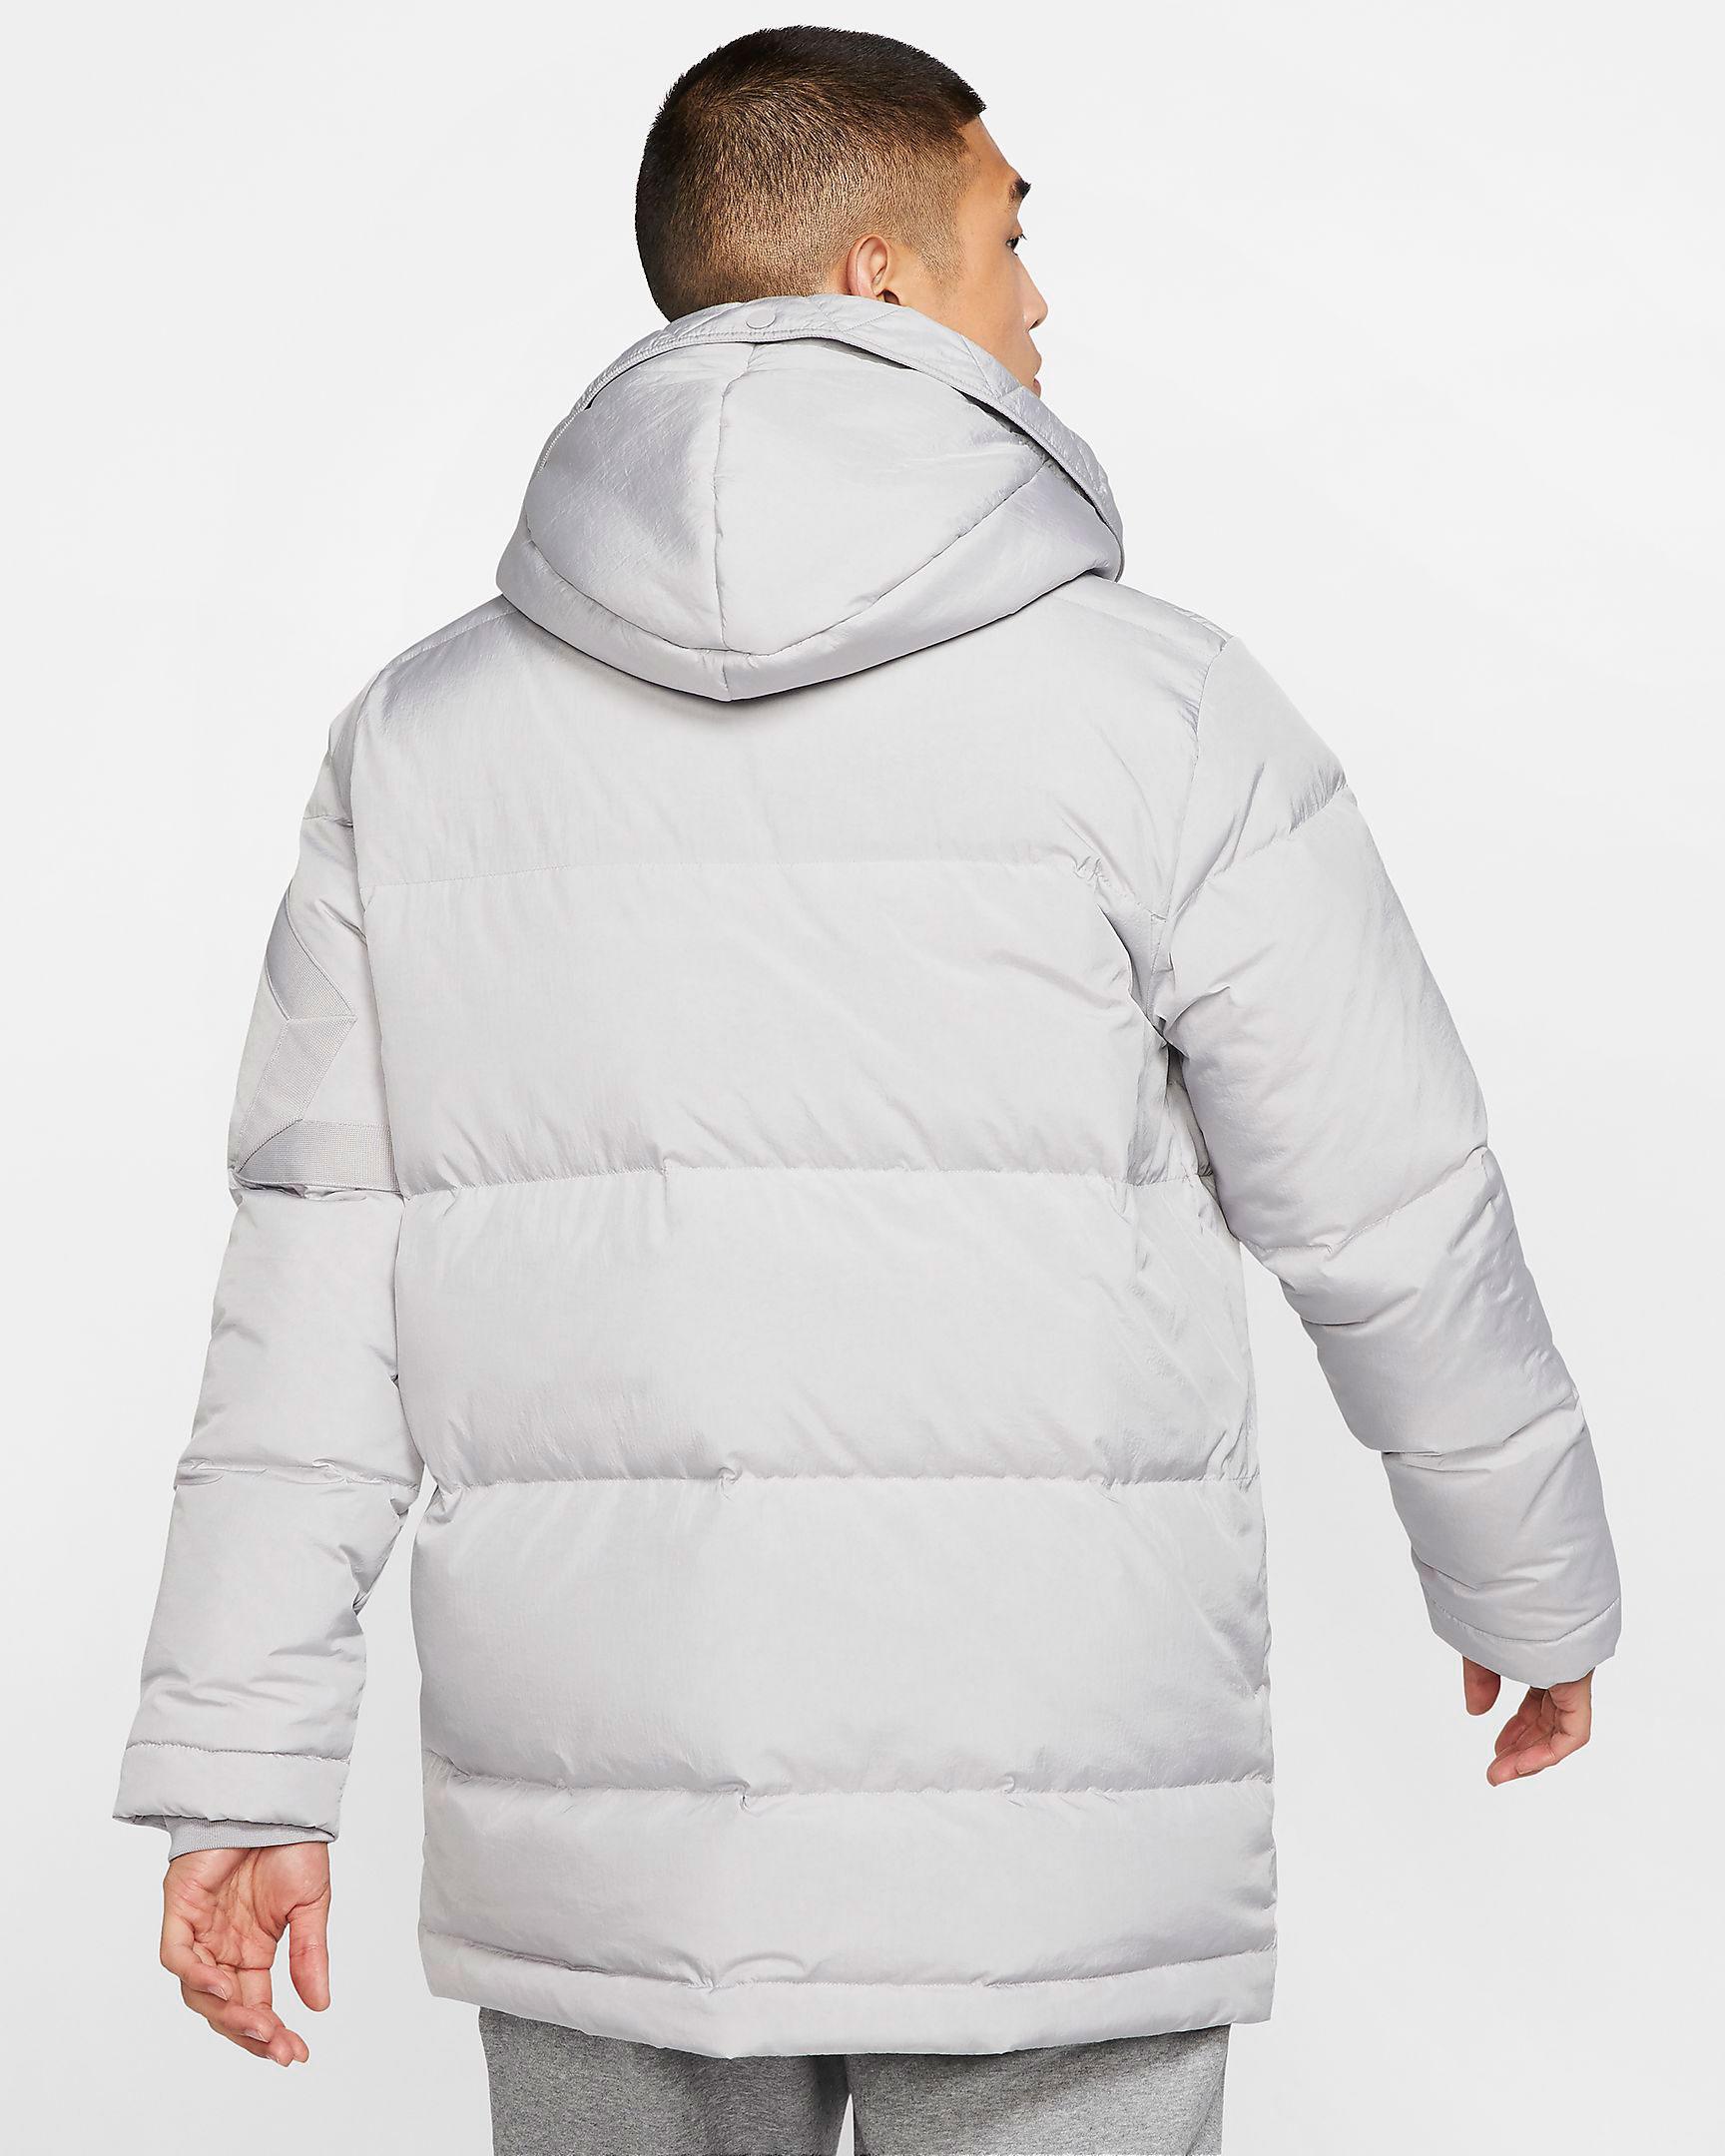 jordan-wings-down-parka-jacket-grey-2